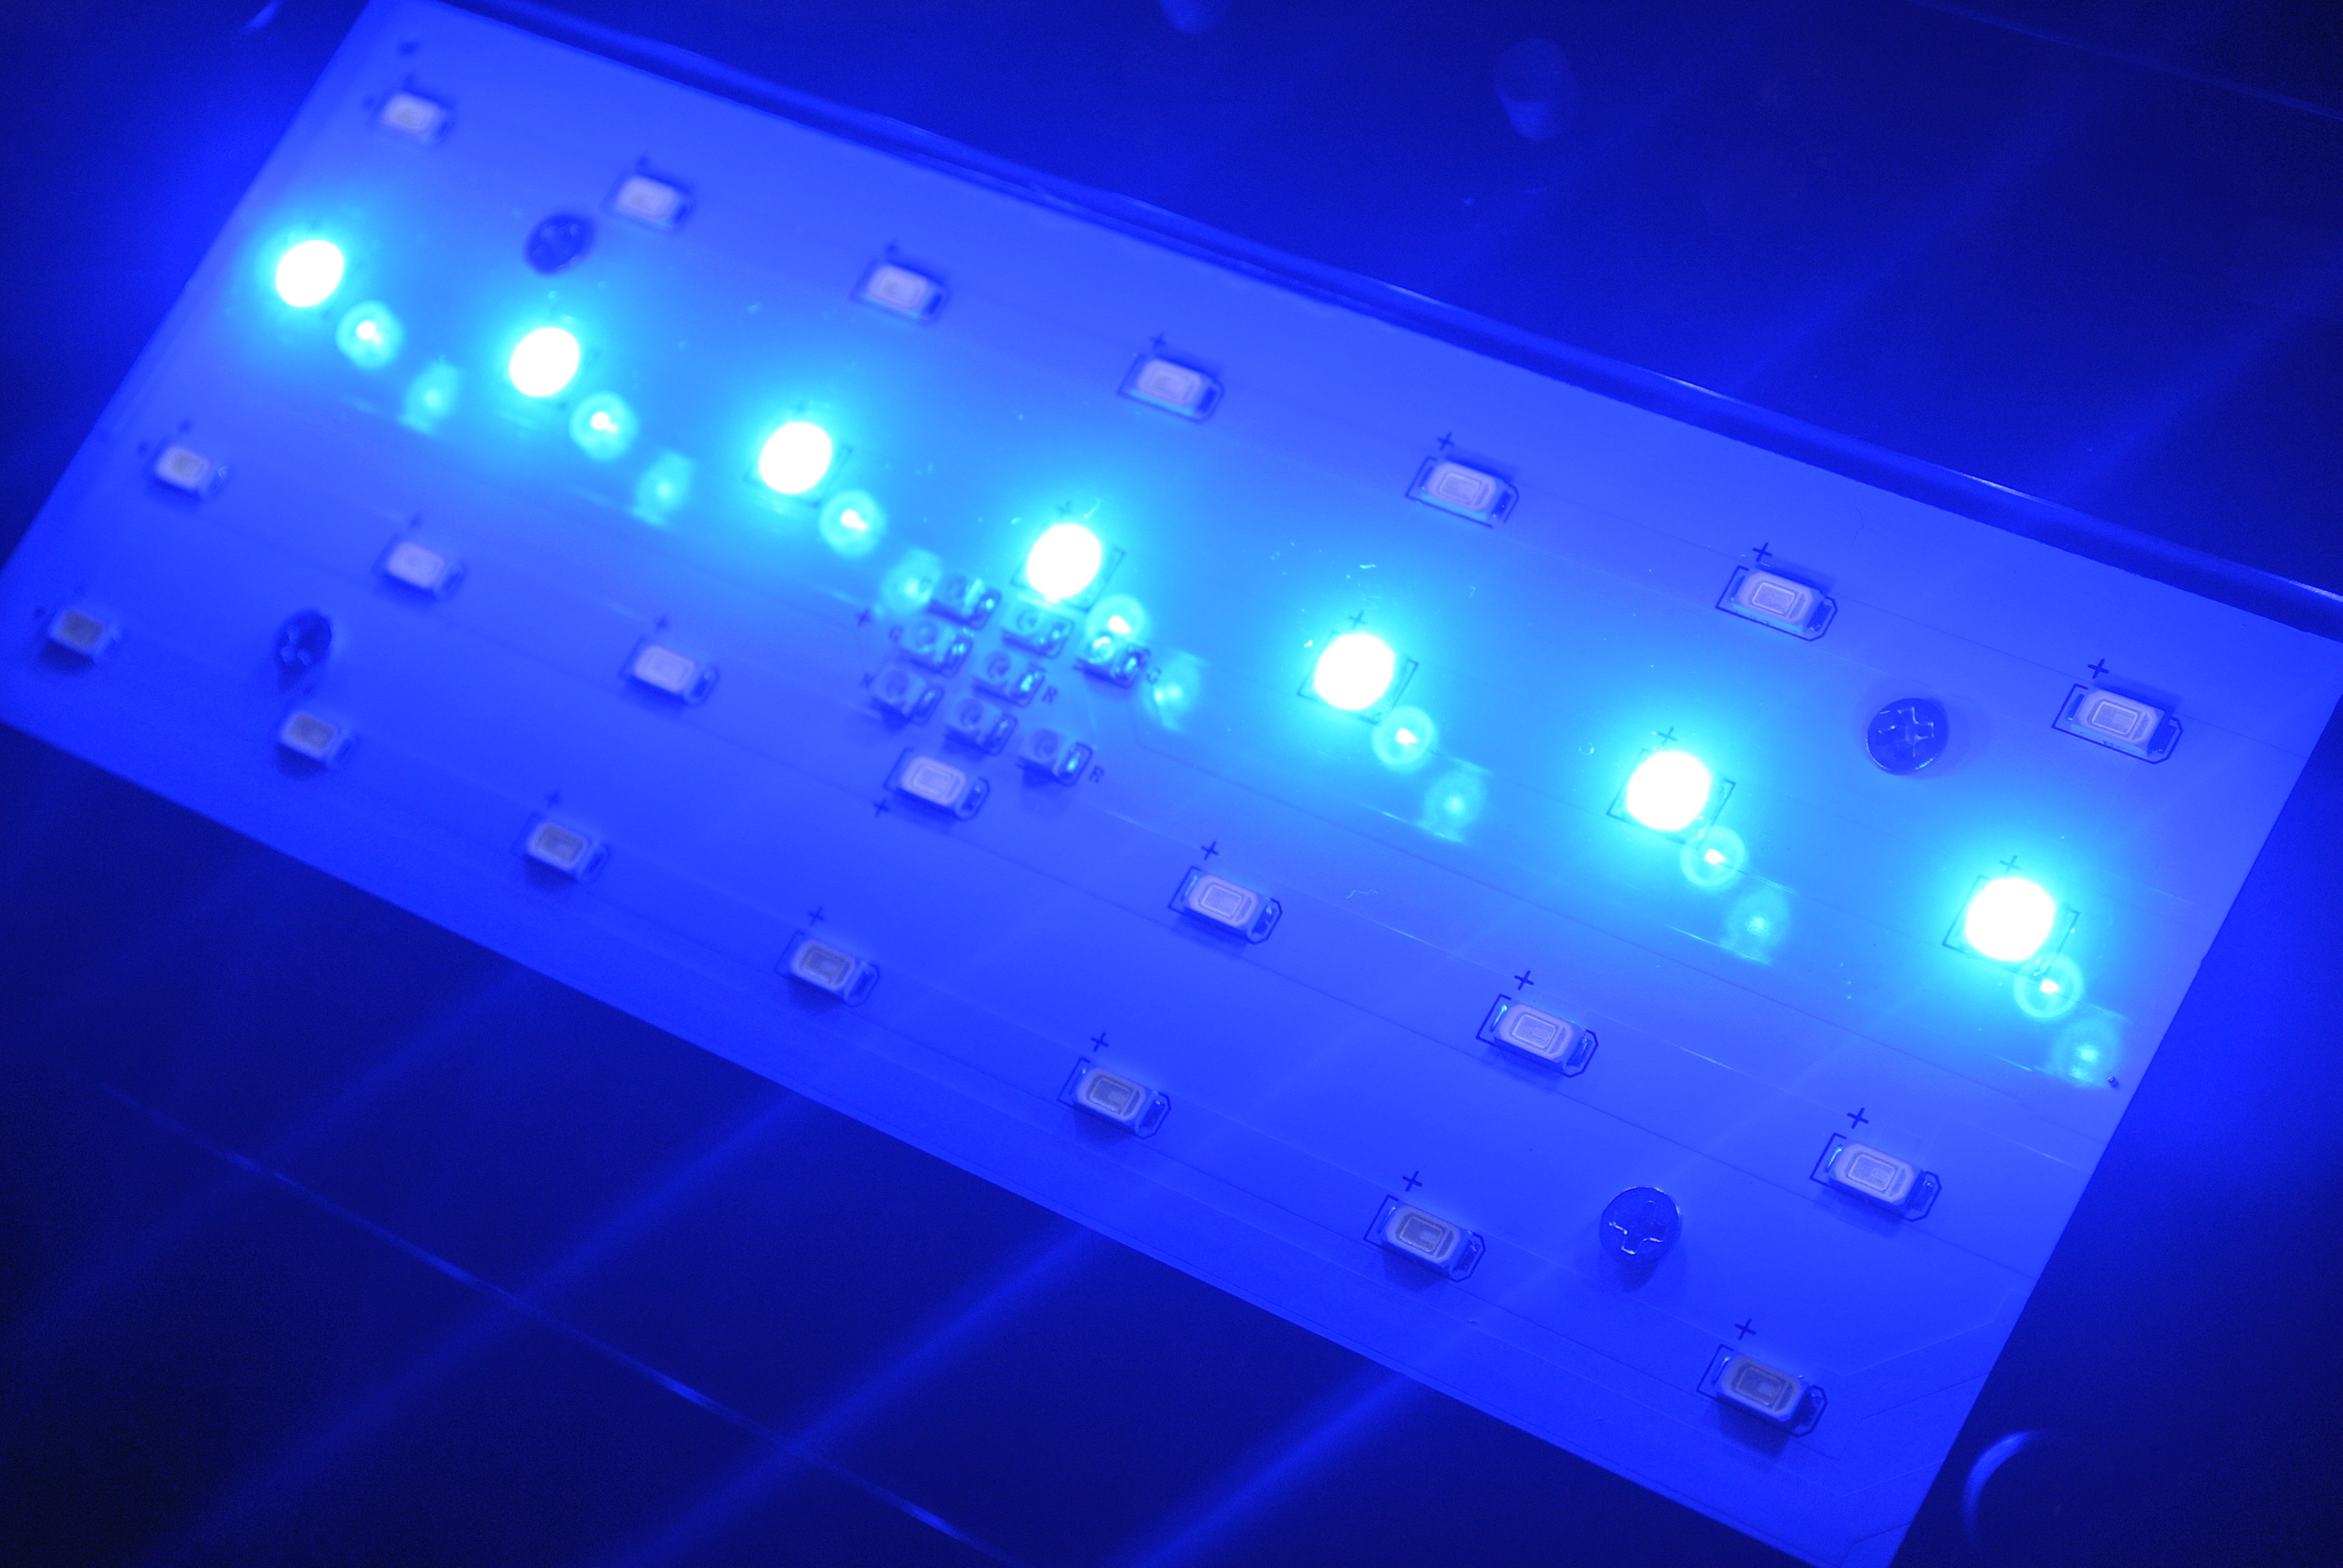 Zetlight ZA1201 16W LED Clamp On Aquarium Light, Marine Gallery